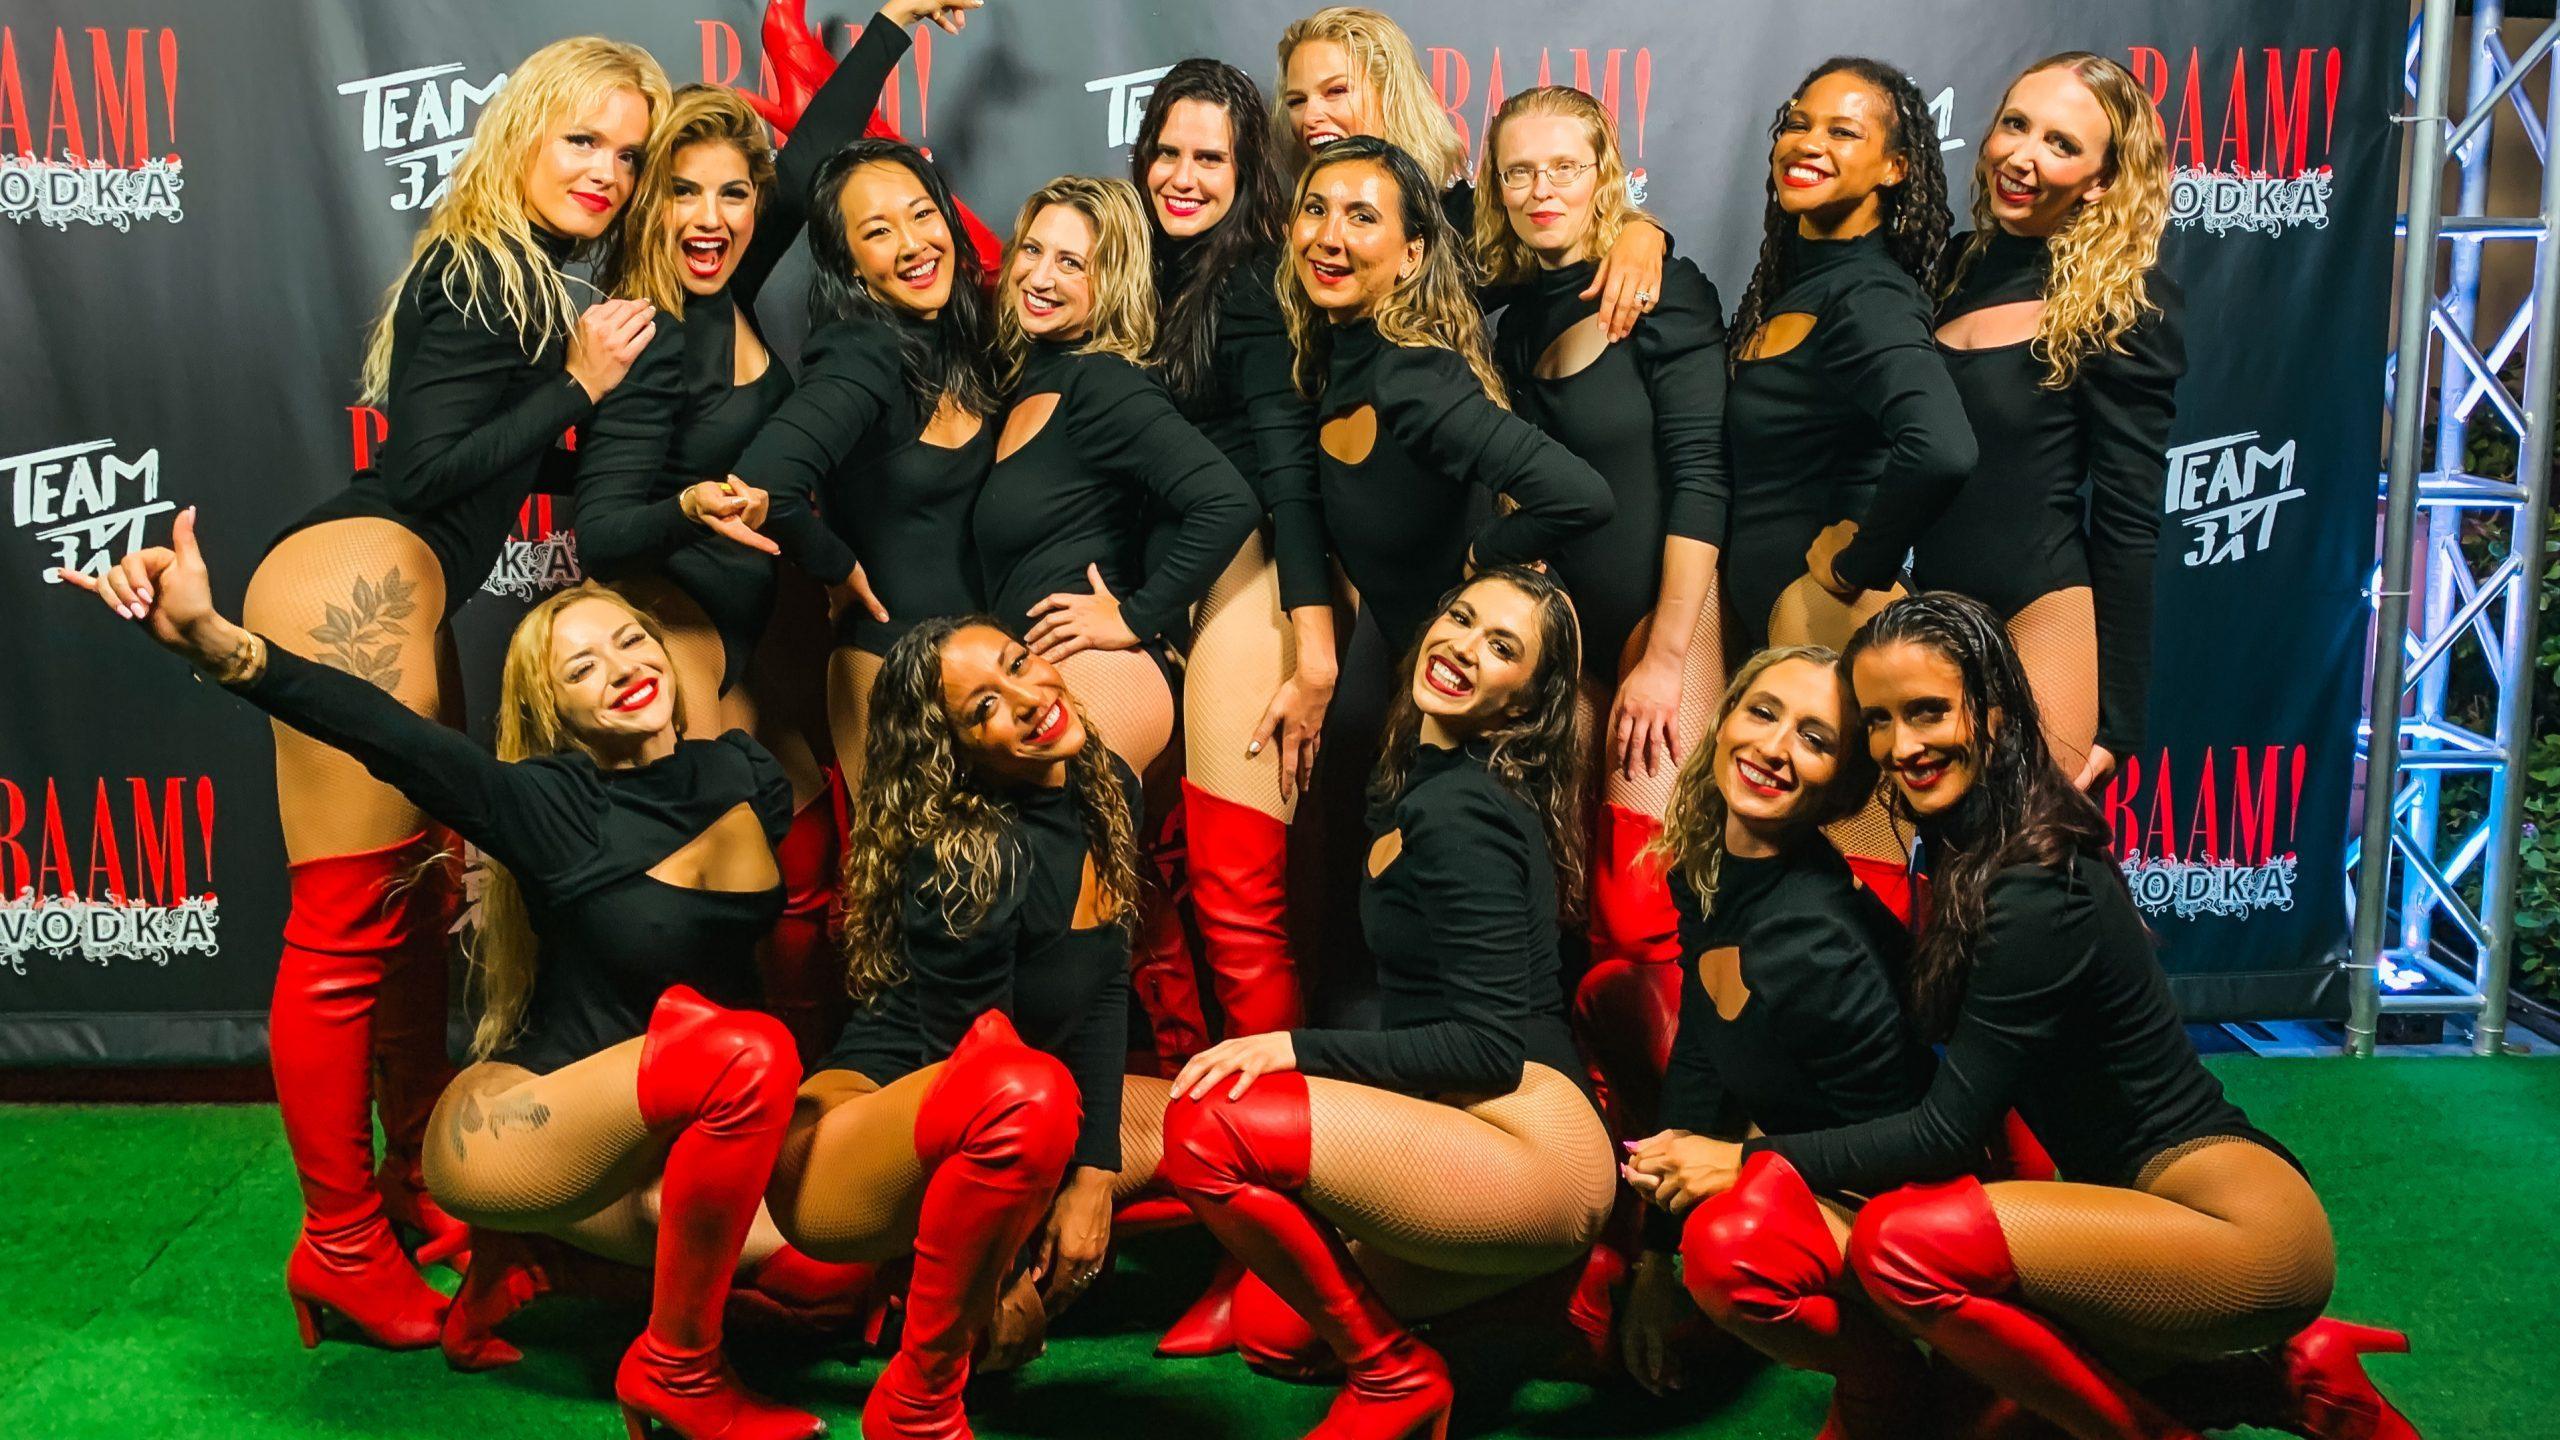 3xt dance company dancers in los angeles